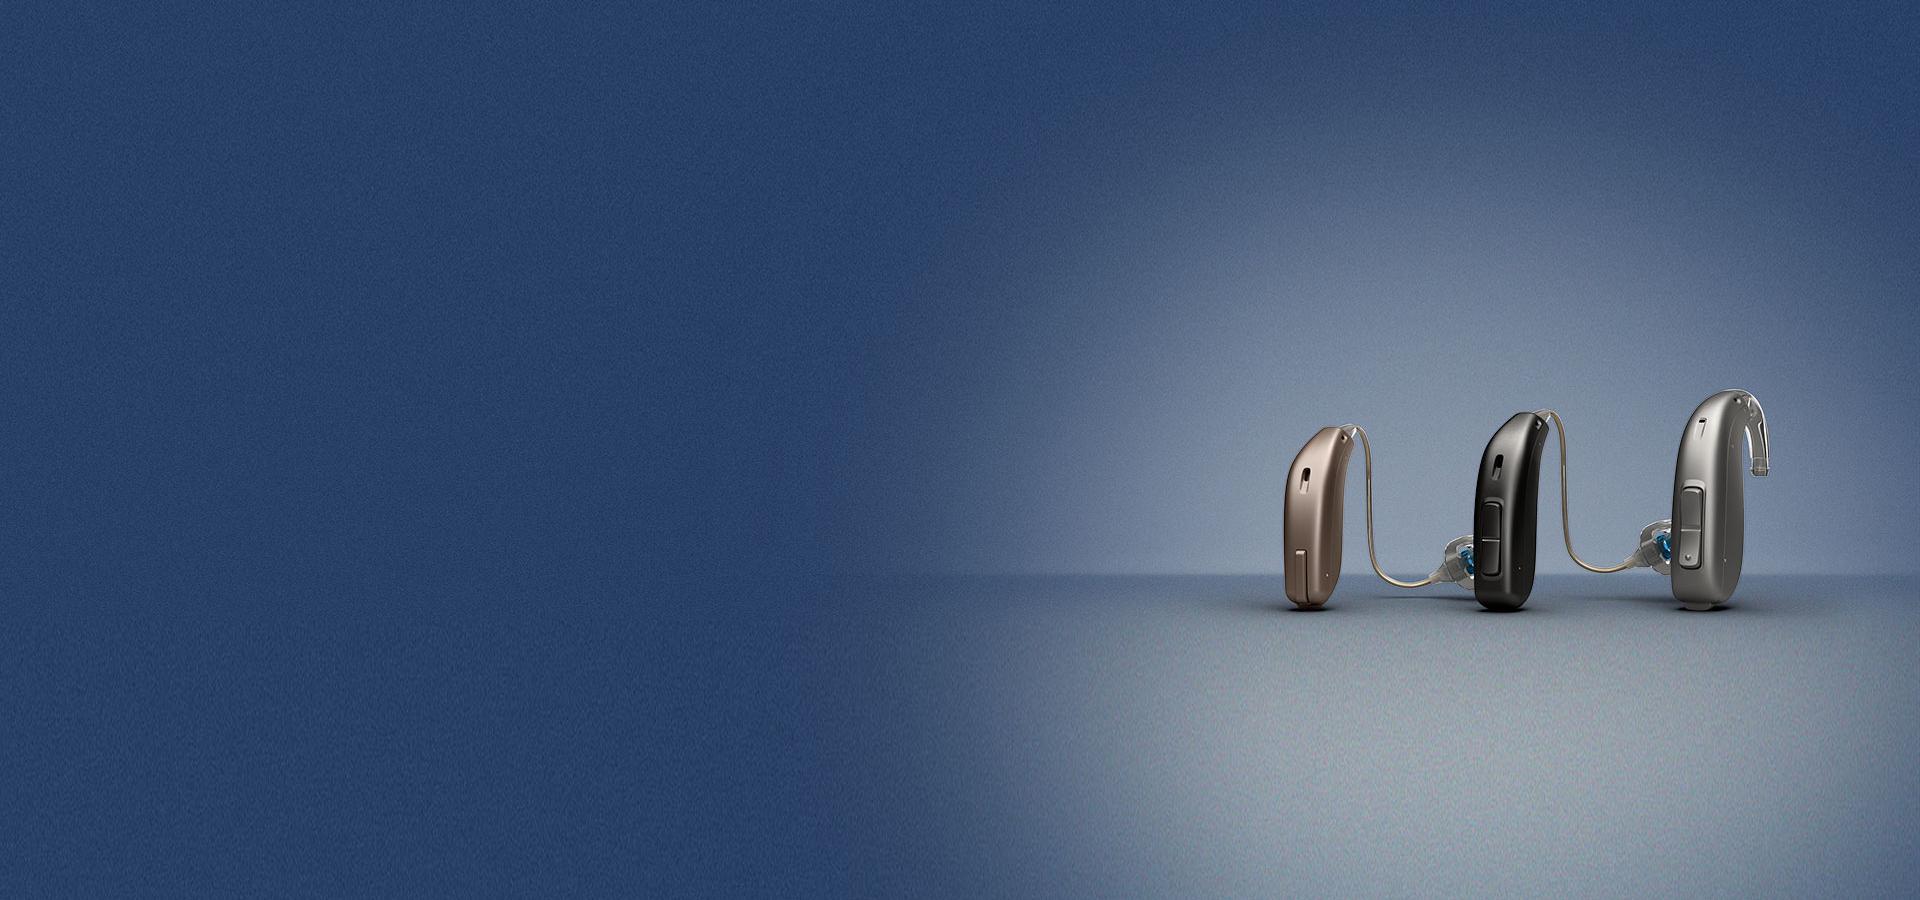 Oticon Opn three hearing aid lineup-1920x900